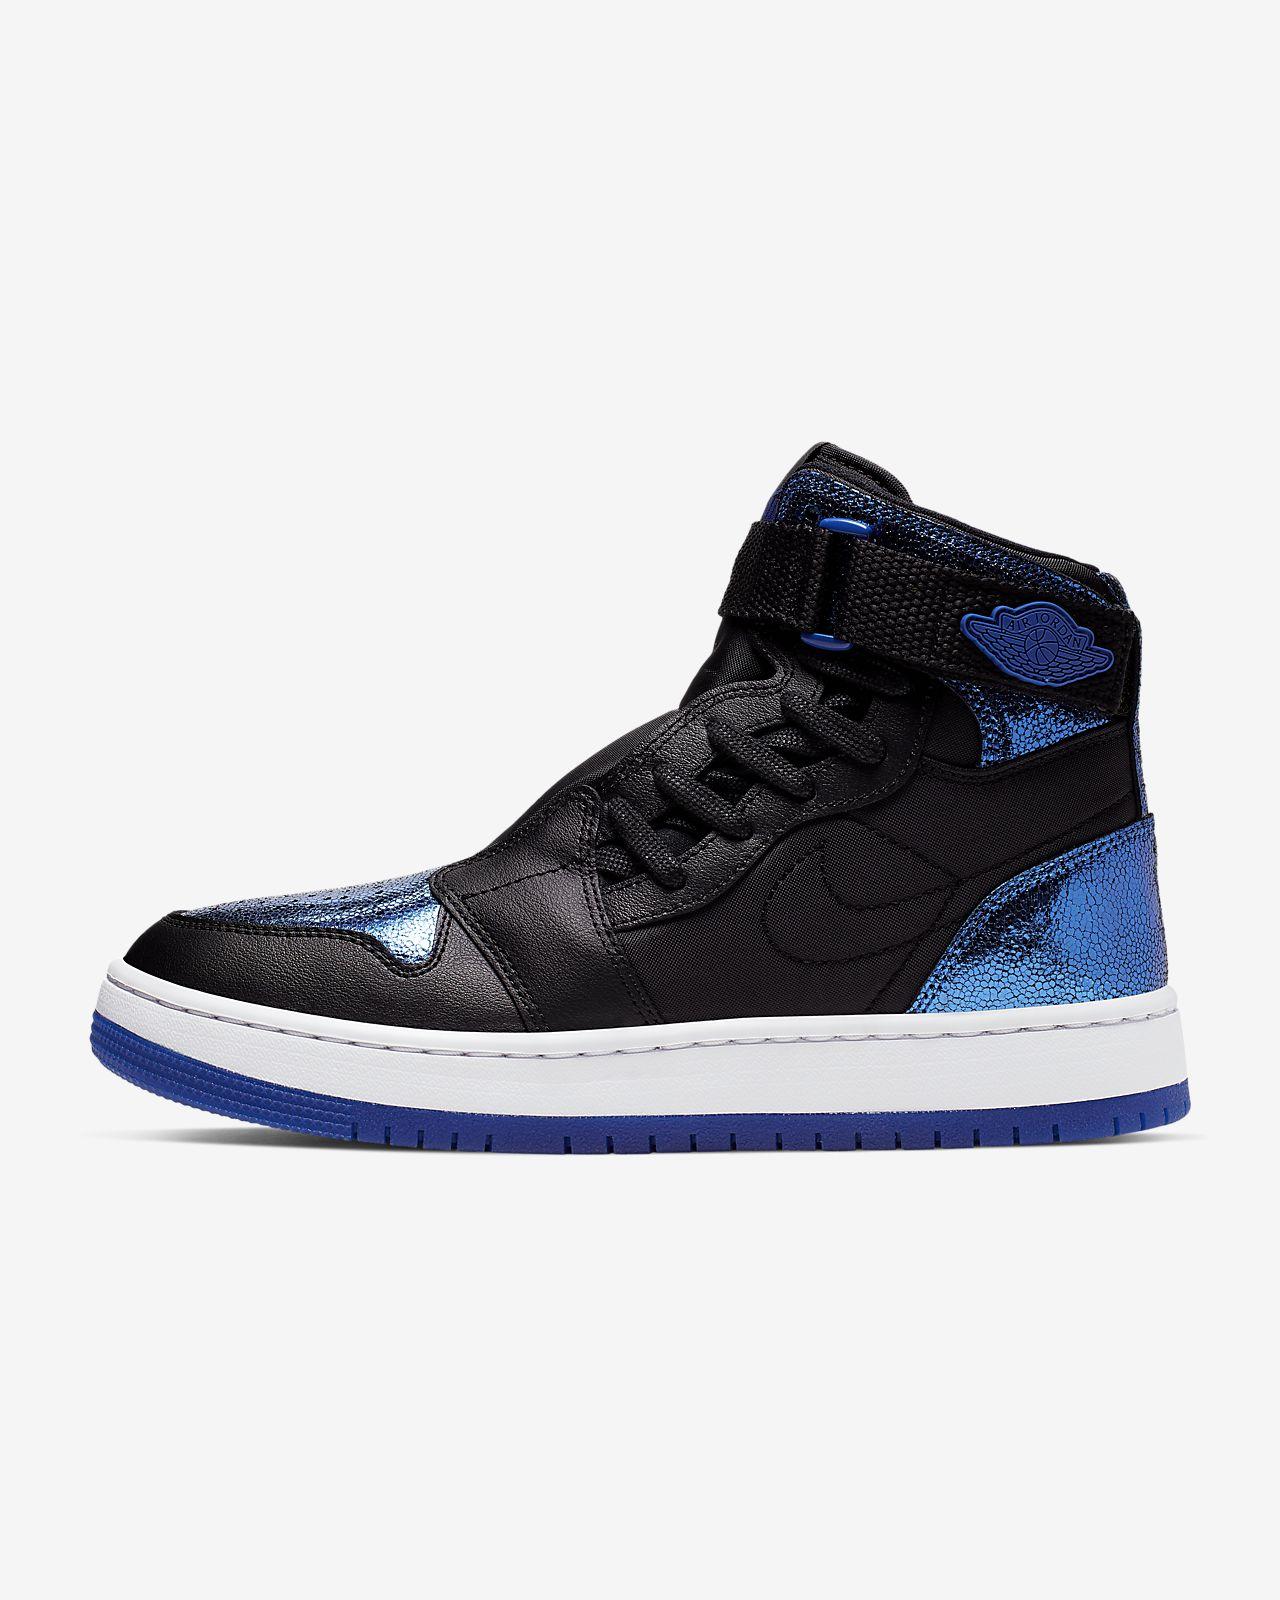 Air Jordan 1 Nova XX Women's Shoe